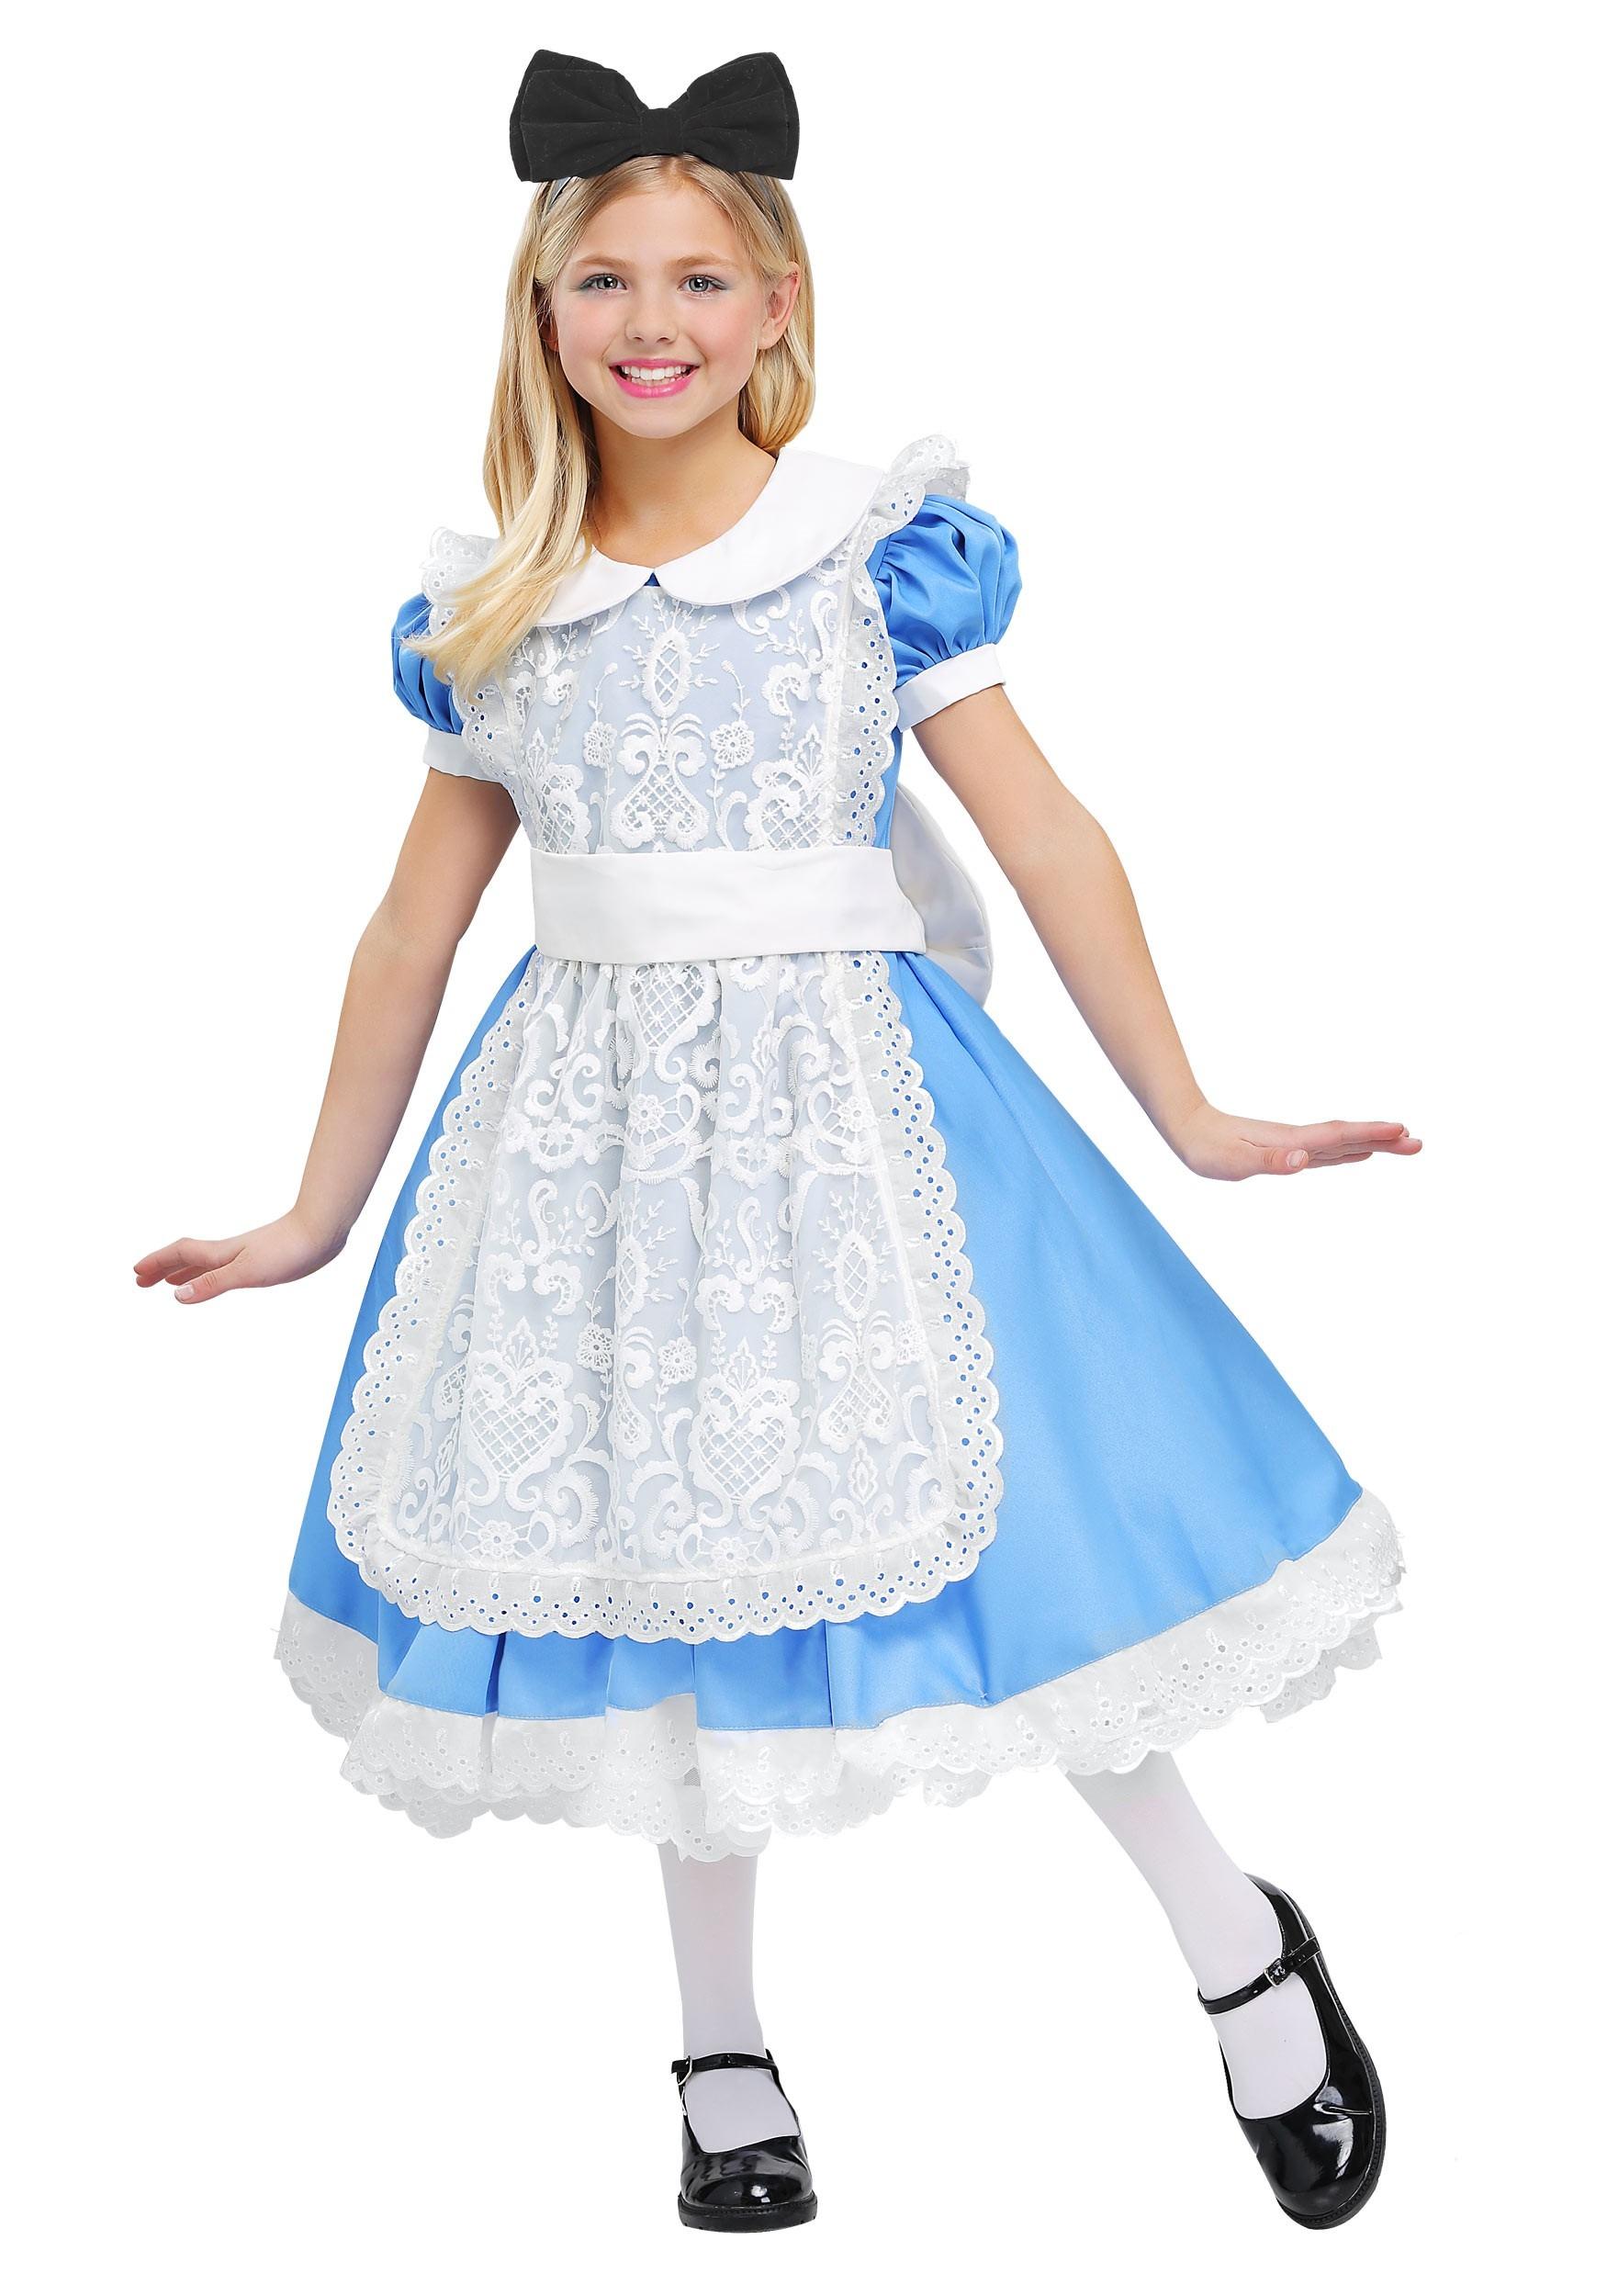 Elite Alice Girls Costume  sc 1 st  Fun.com & Elite Alice Costume for Girls